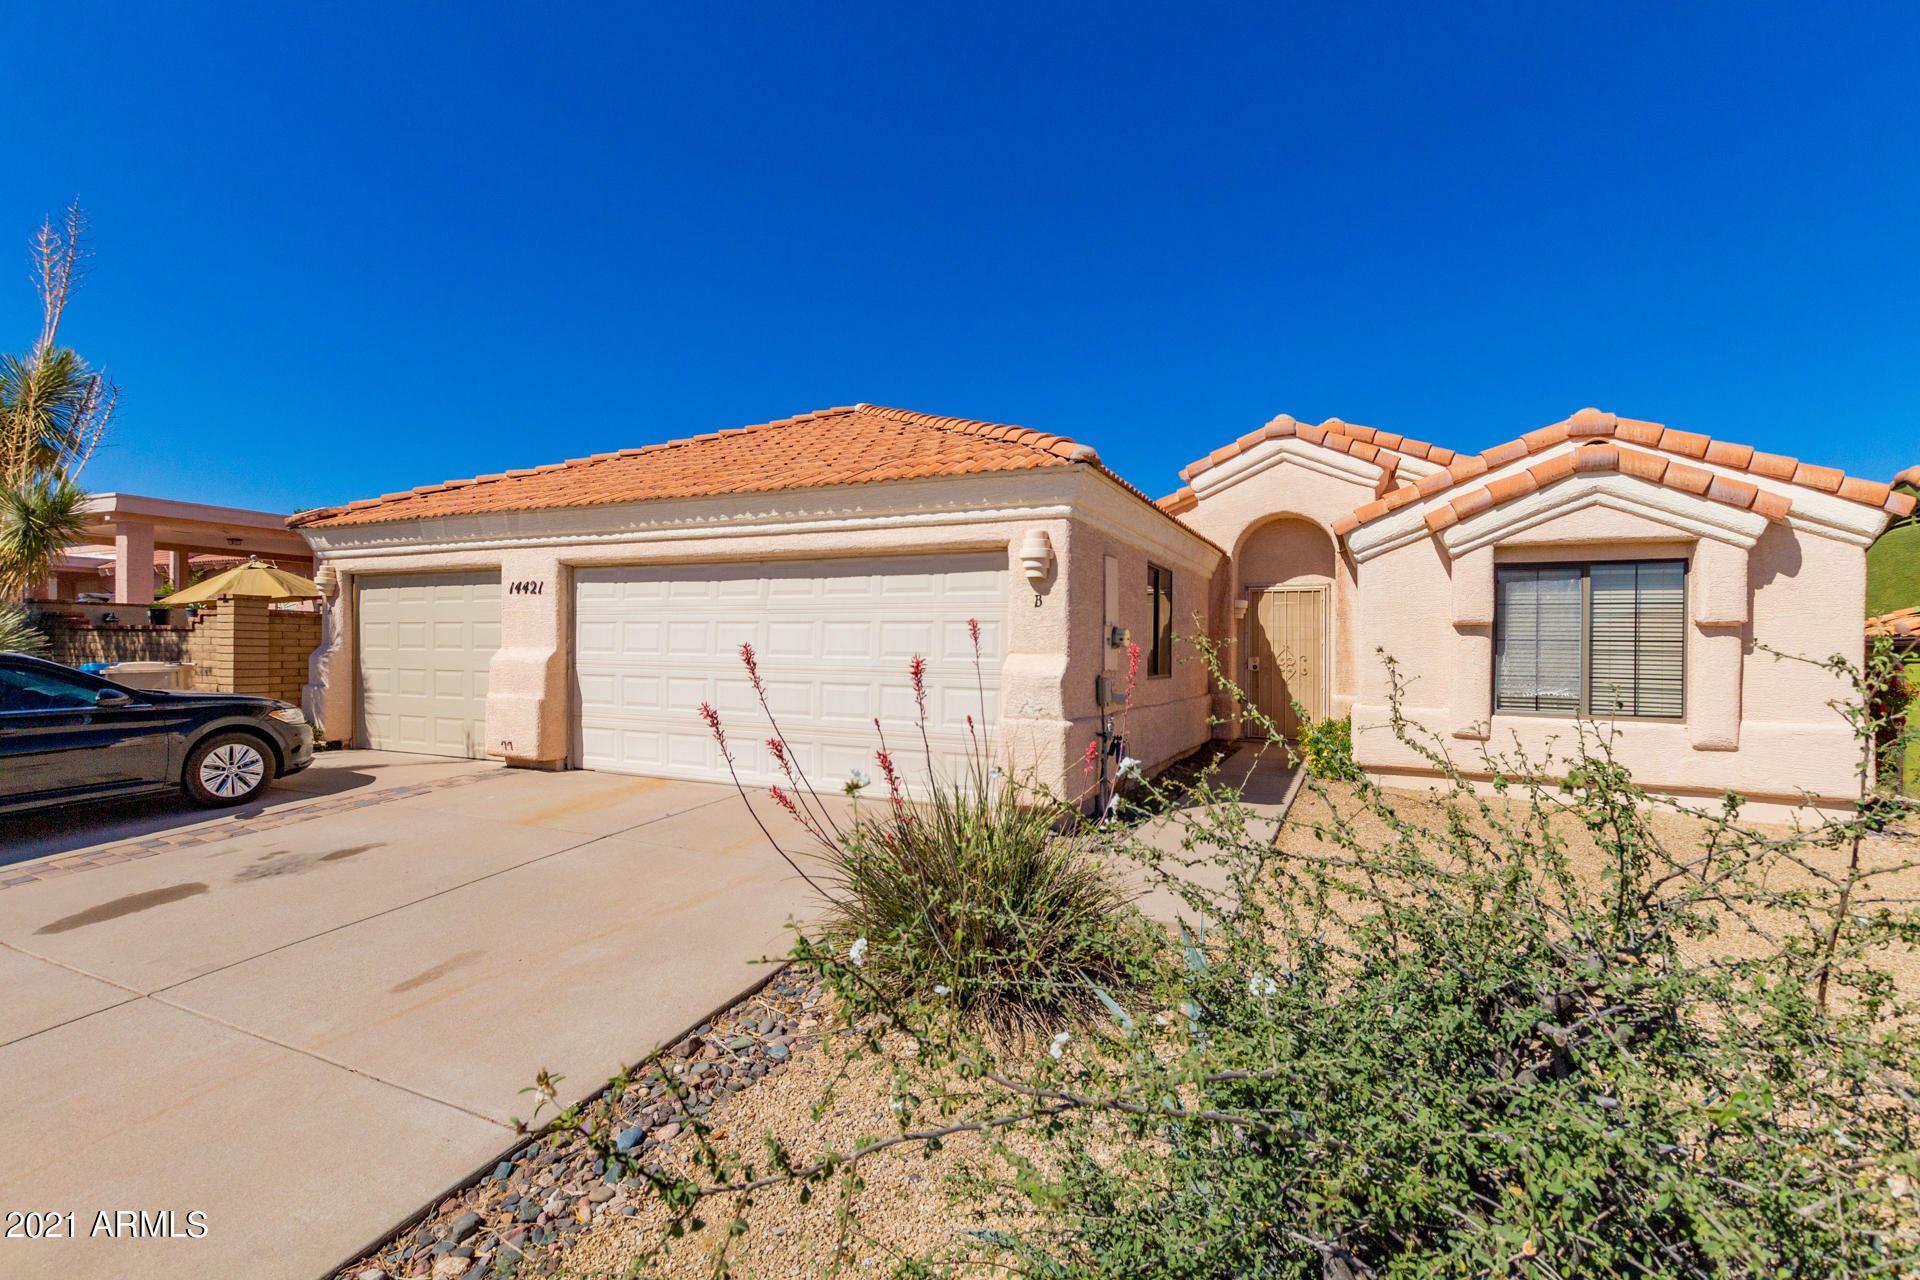 Photo of 14421 N IBSEN Drive #B, Fountain Hills, AZ 85268 (MLS # 6229771)